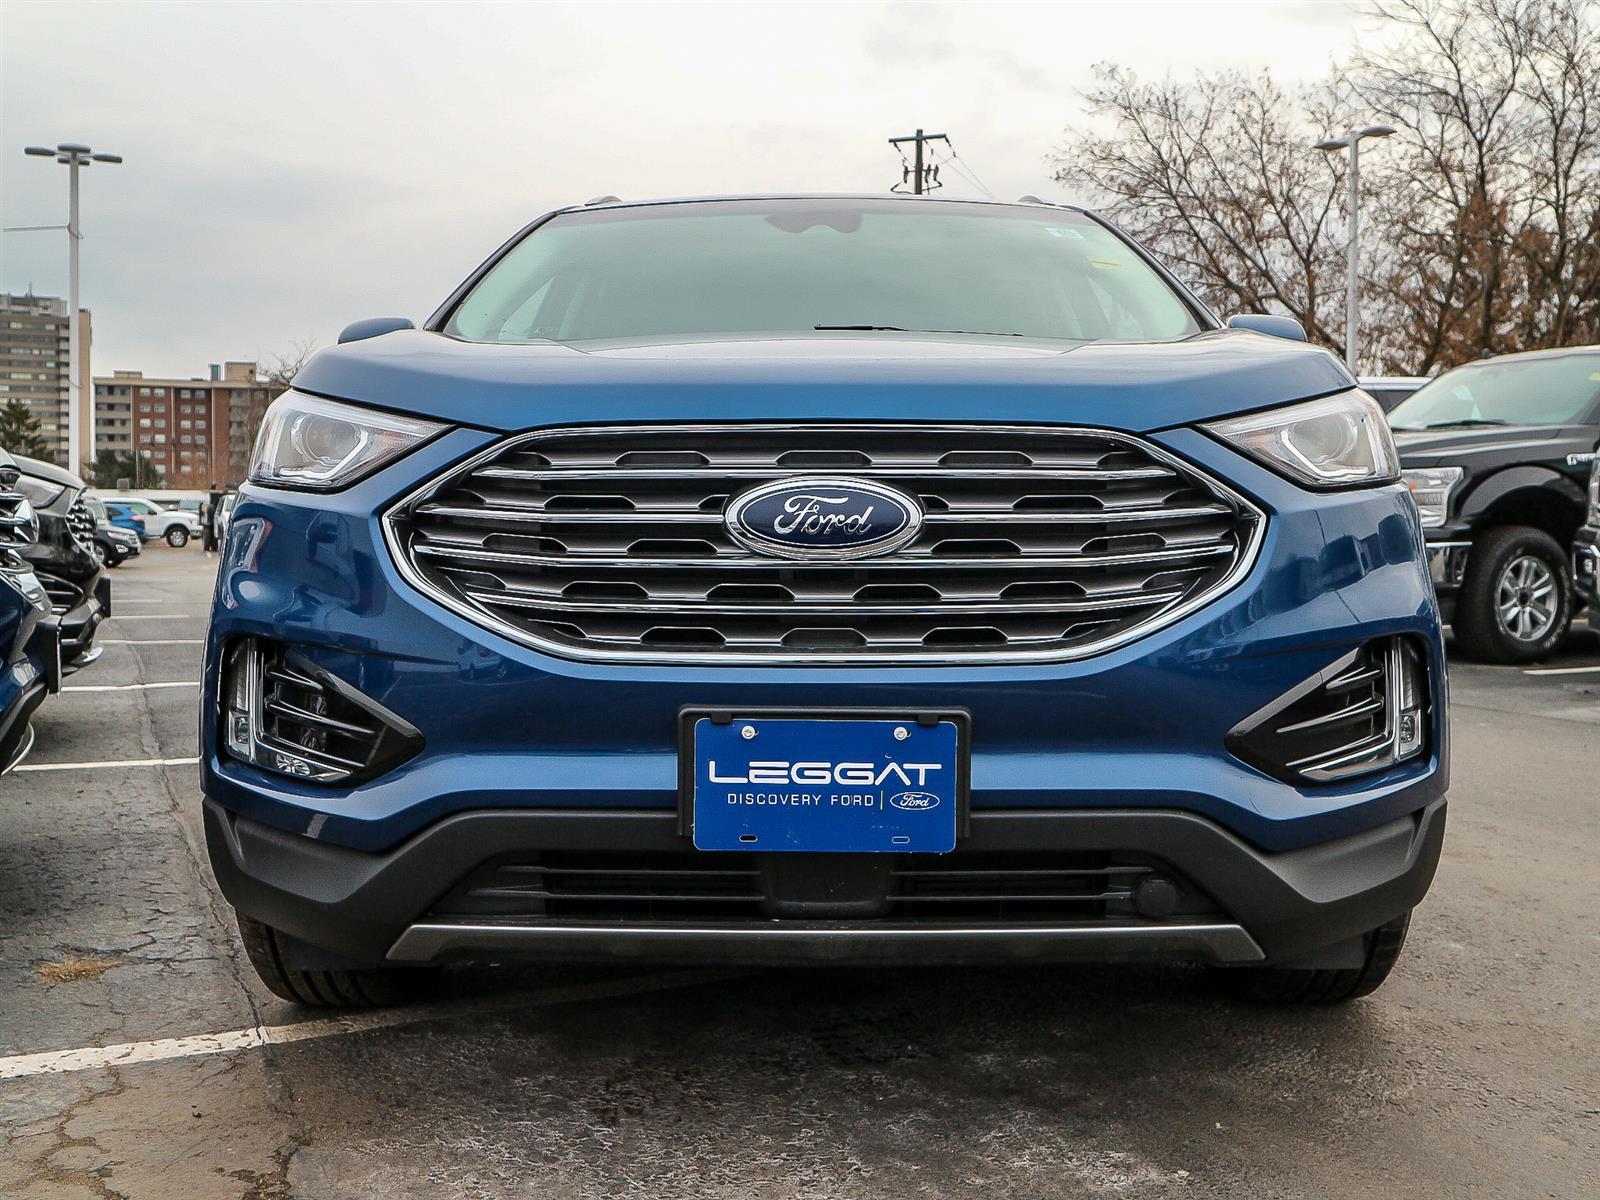 Leggat Discovery Ford | 2020 Ford Edge Titanium Atlas Blue ...